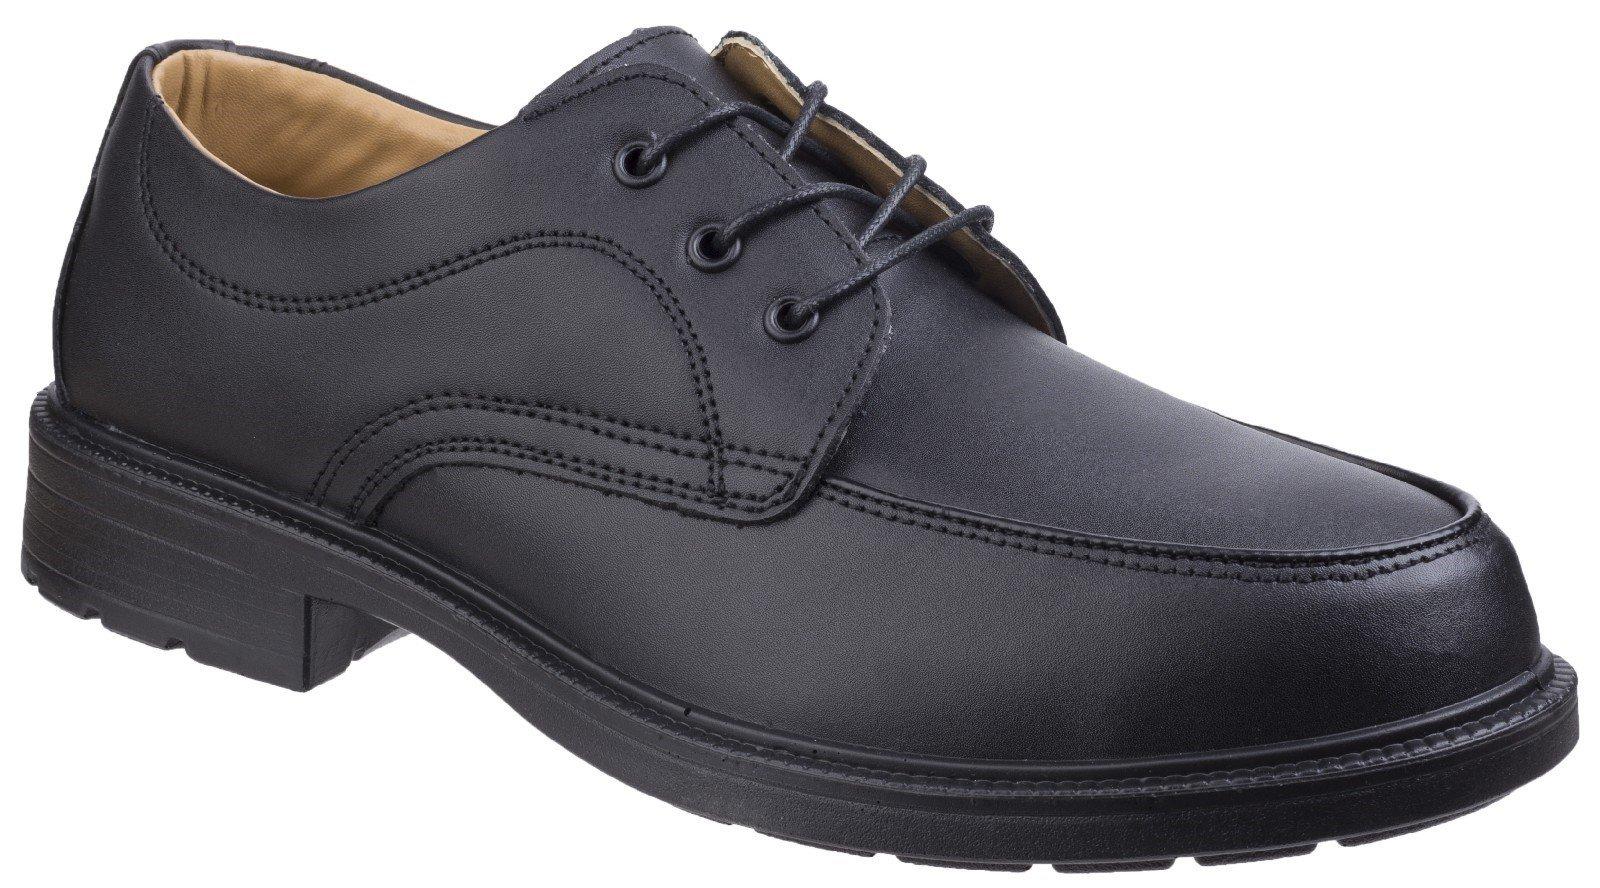 Amblers Unisex Safety Gibson Lace Shoes Black 01055 - Black 5